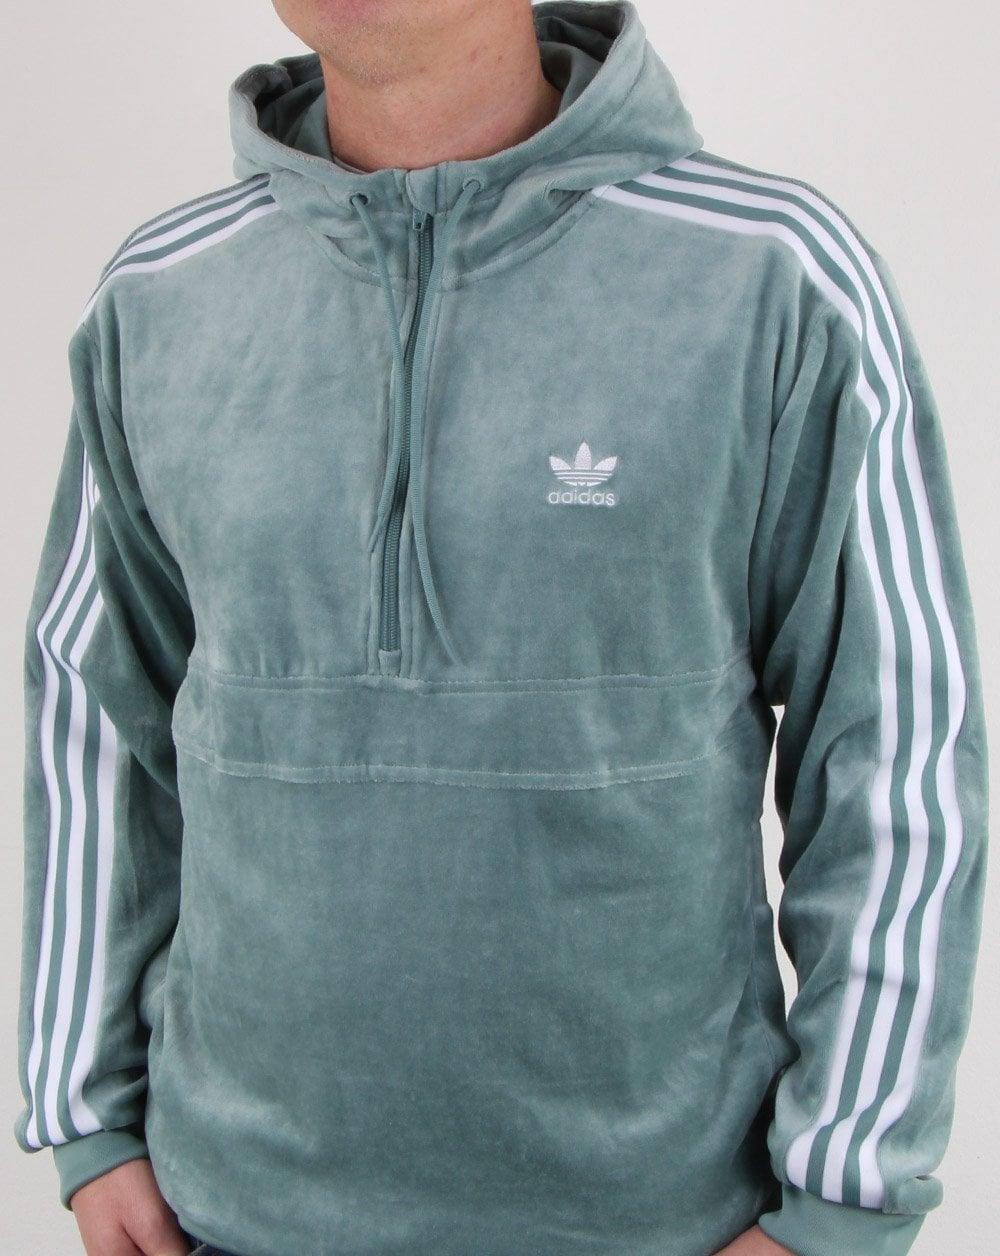 2ee6bc8d0dc adidas Originals Adidas Originals Velour Half Zip Hoody Vapour Green